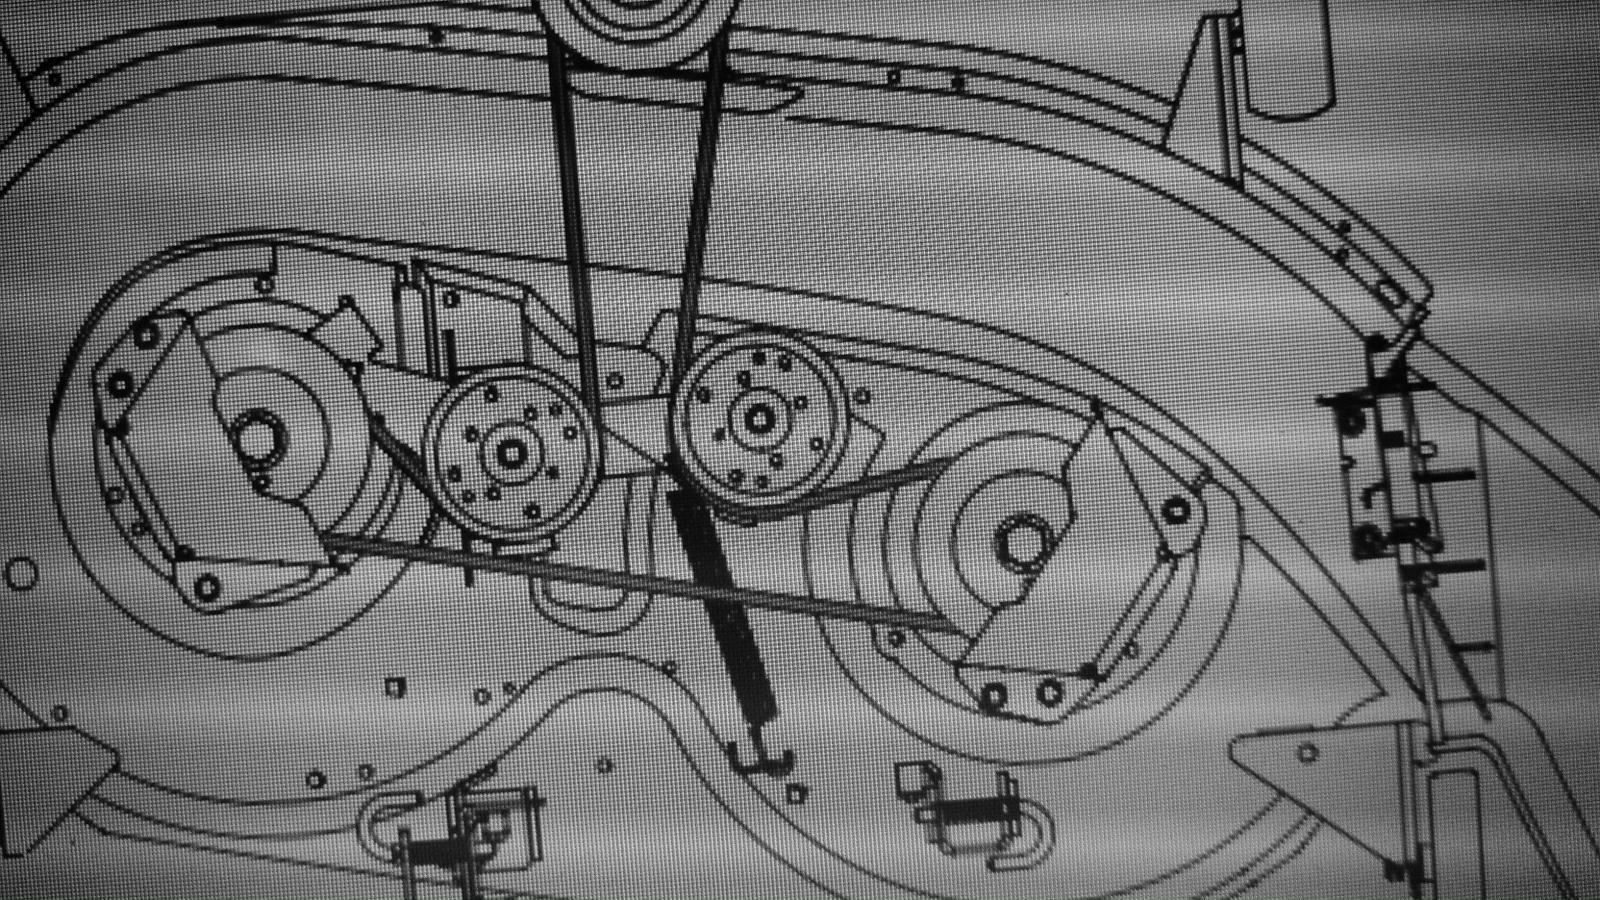 Cub Cadet Mower-Deck belt problems! - Tech Support Forum on kawasaki wiring diagram, club car wiring diagram, columbia wiring diagram, roper wiring diagram, atlas wiring diagram, clark wiring diagram, scotts wiring diagram, briggs and stratton ignition system diagram, ford new holland wiring diagram, simplicity wiring diagram, kubota wiring diagram, electrial lt1045 block diagram, kubota t1460 transmission diagram, lt 1042 diagram, mtd wiring diagram, cockshutt wiring diagram, farmall cub distributor diagram, apache wiring diagram, farmall wiring harness diagram, sears wiring diagram,